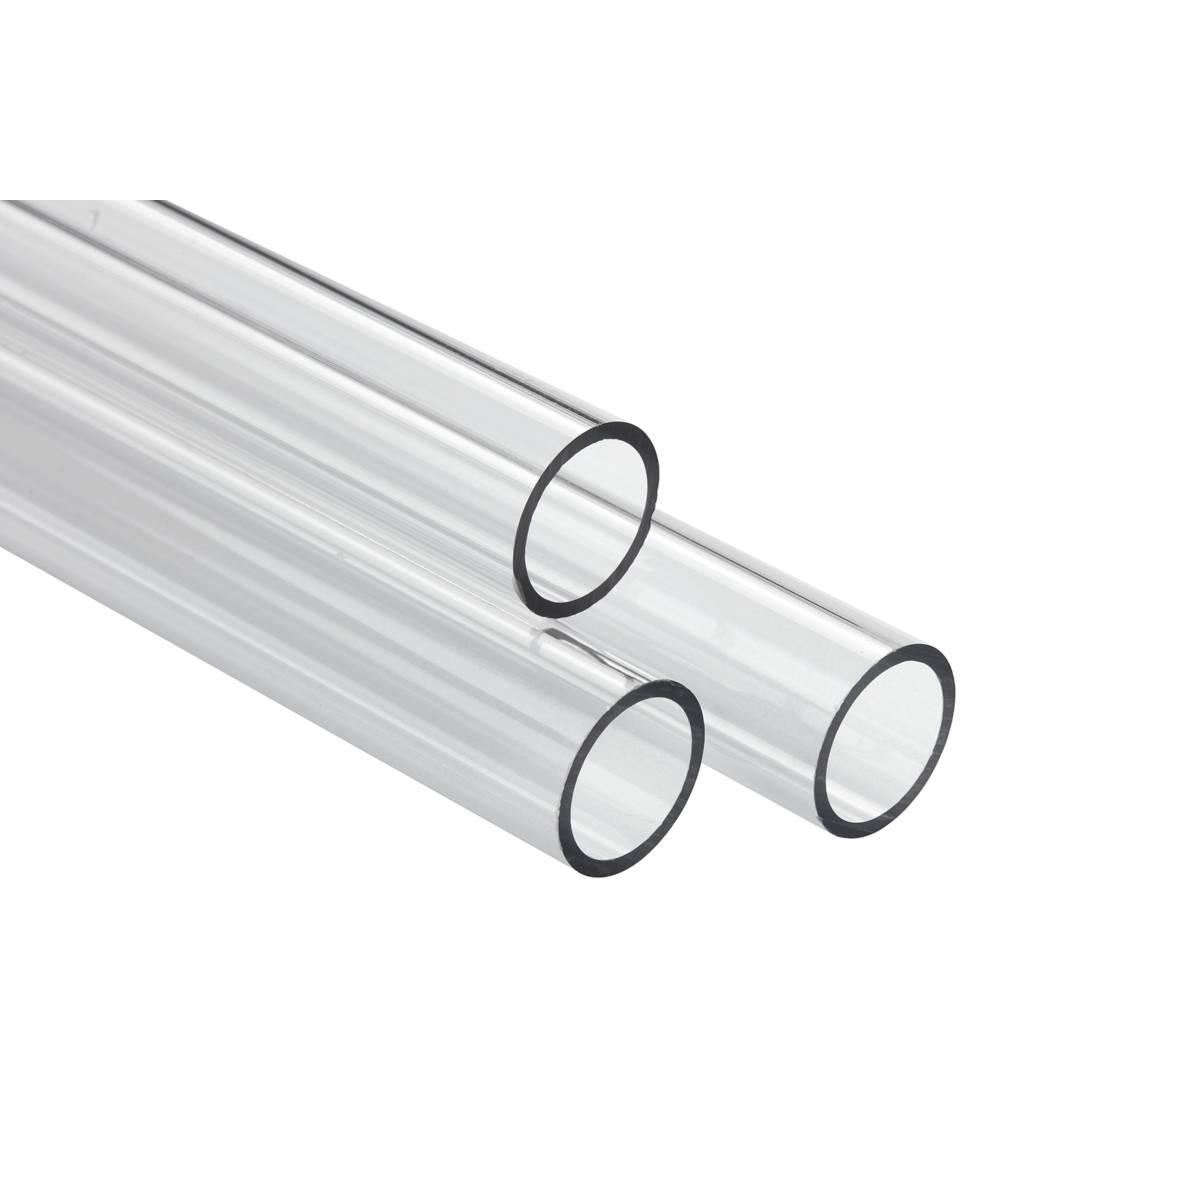 CORSAIR Hydro X Series XT Hardline 12mm Tubing